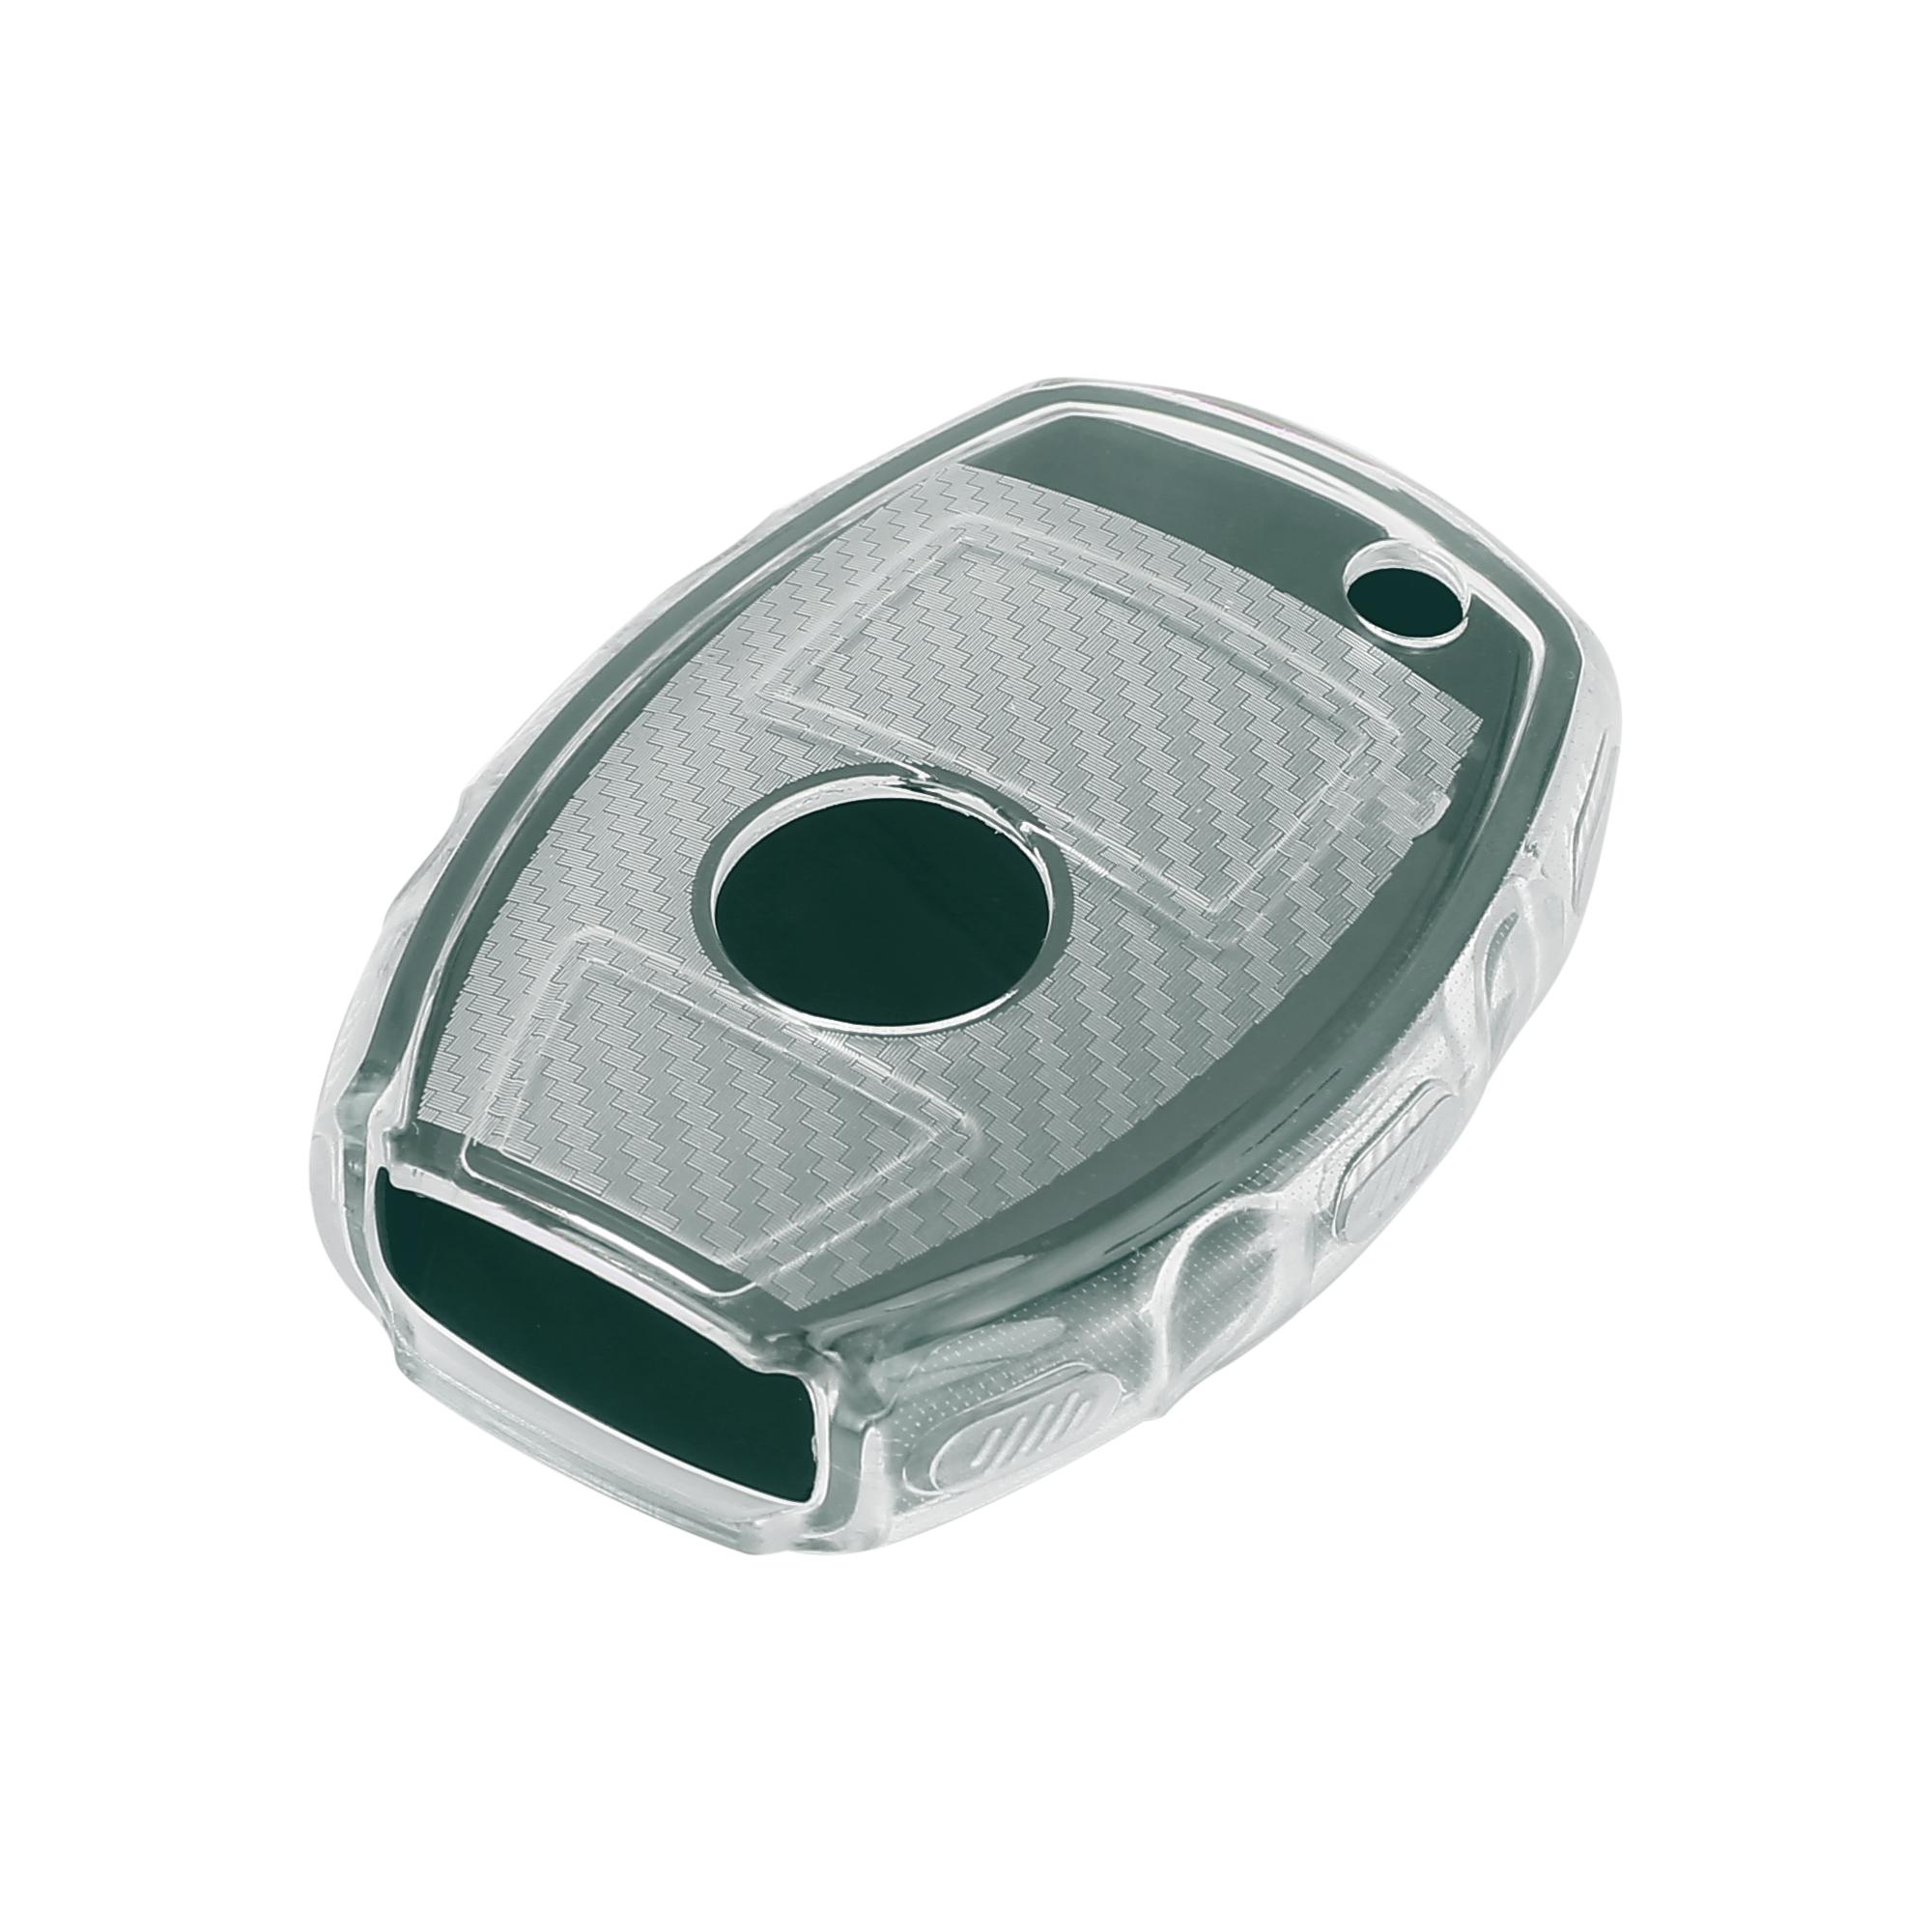 Keyless Remote Key Case Key Fob Shell Cover for Mercedes Benz Dark Green